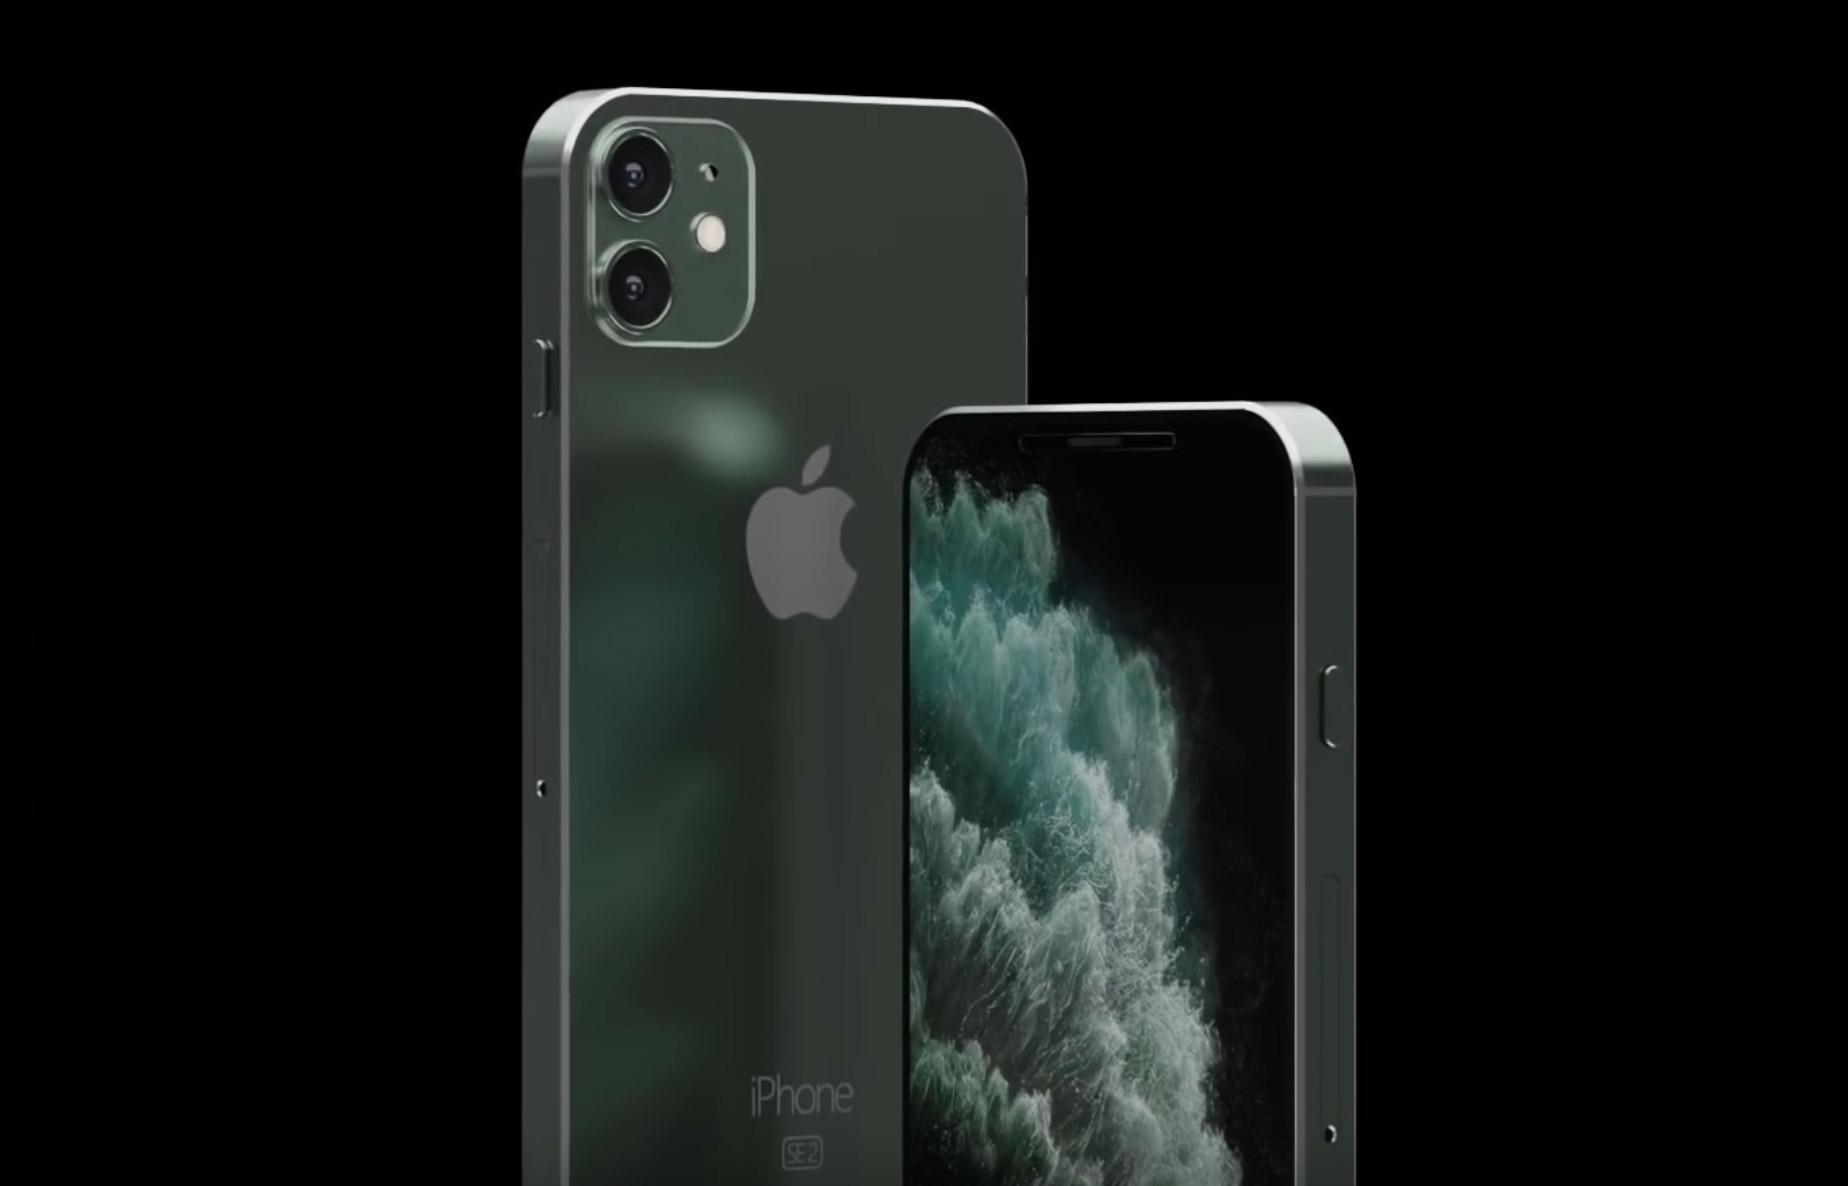 iPhone SE 2 5G